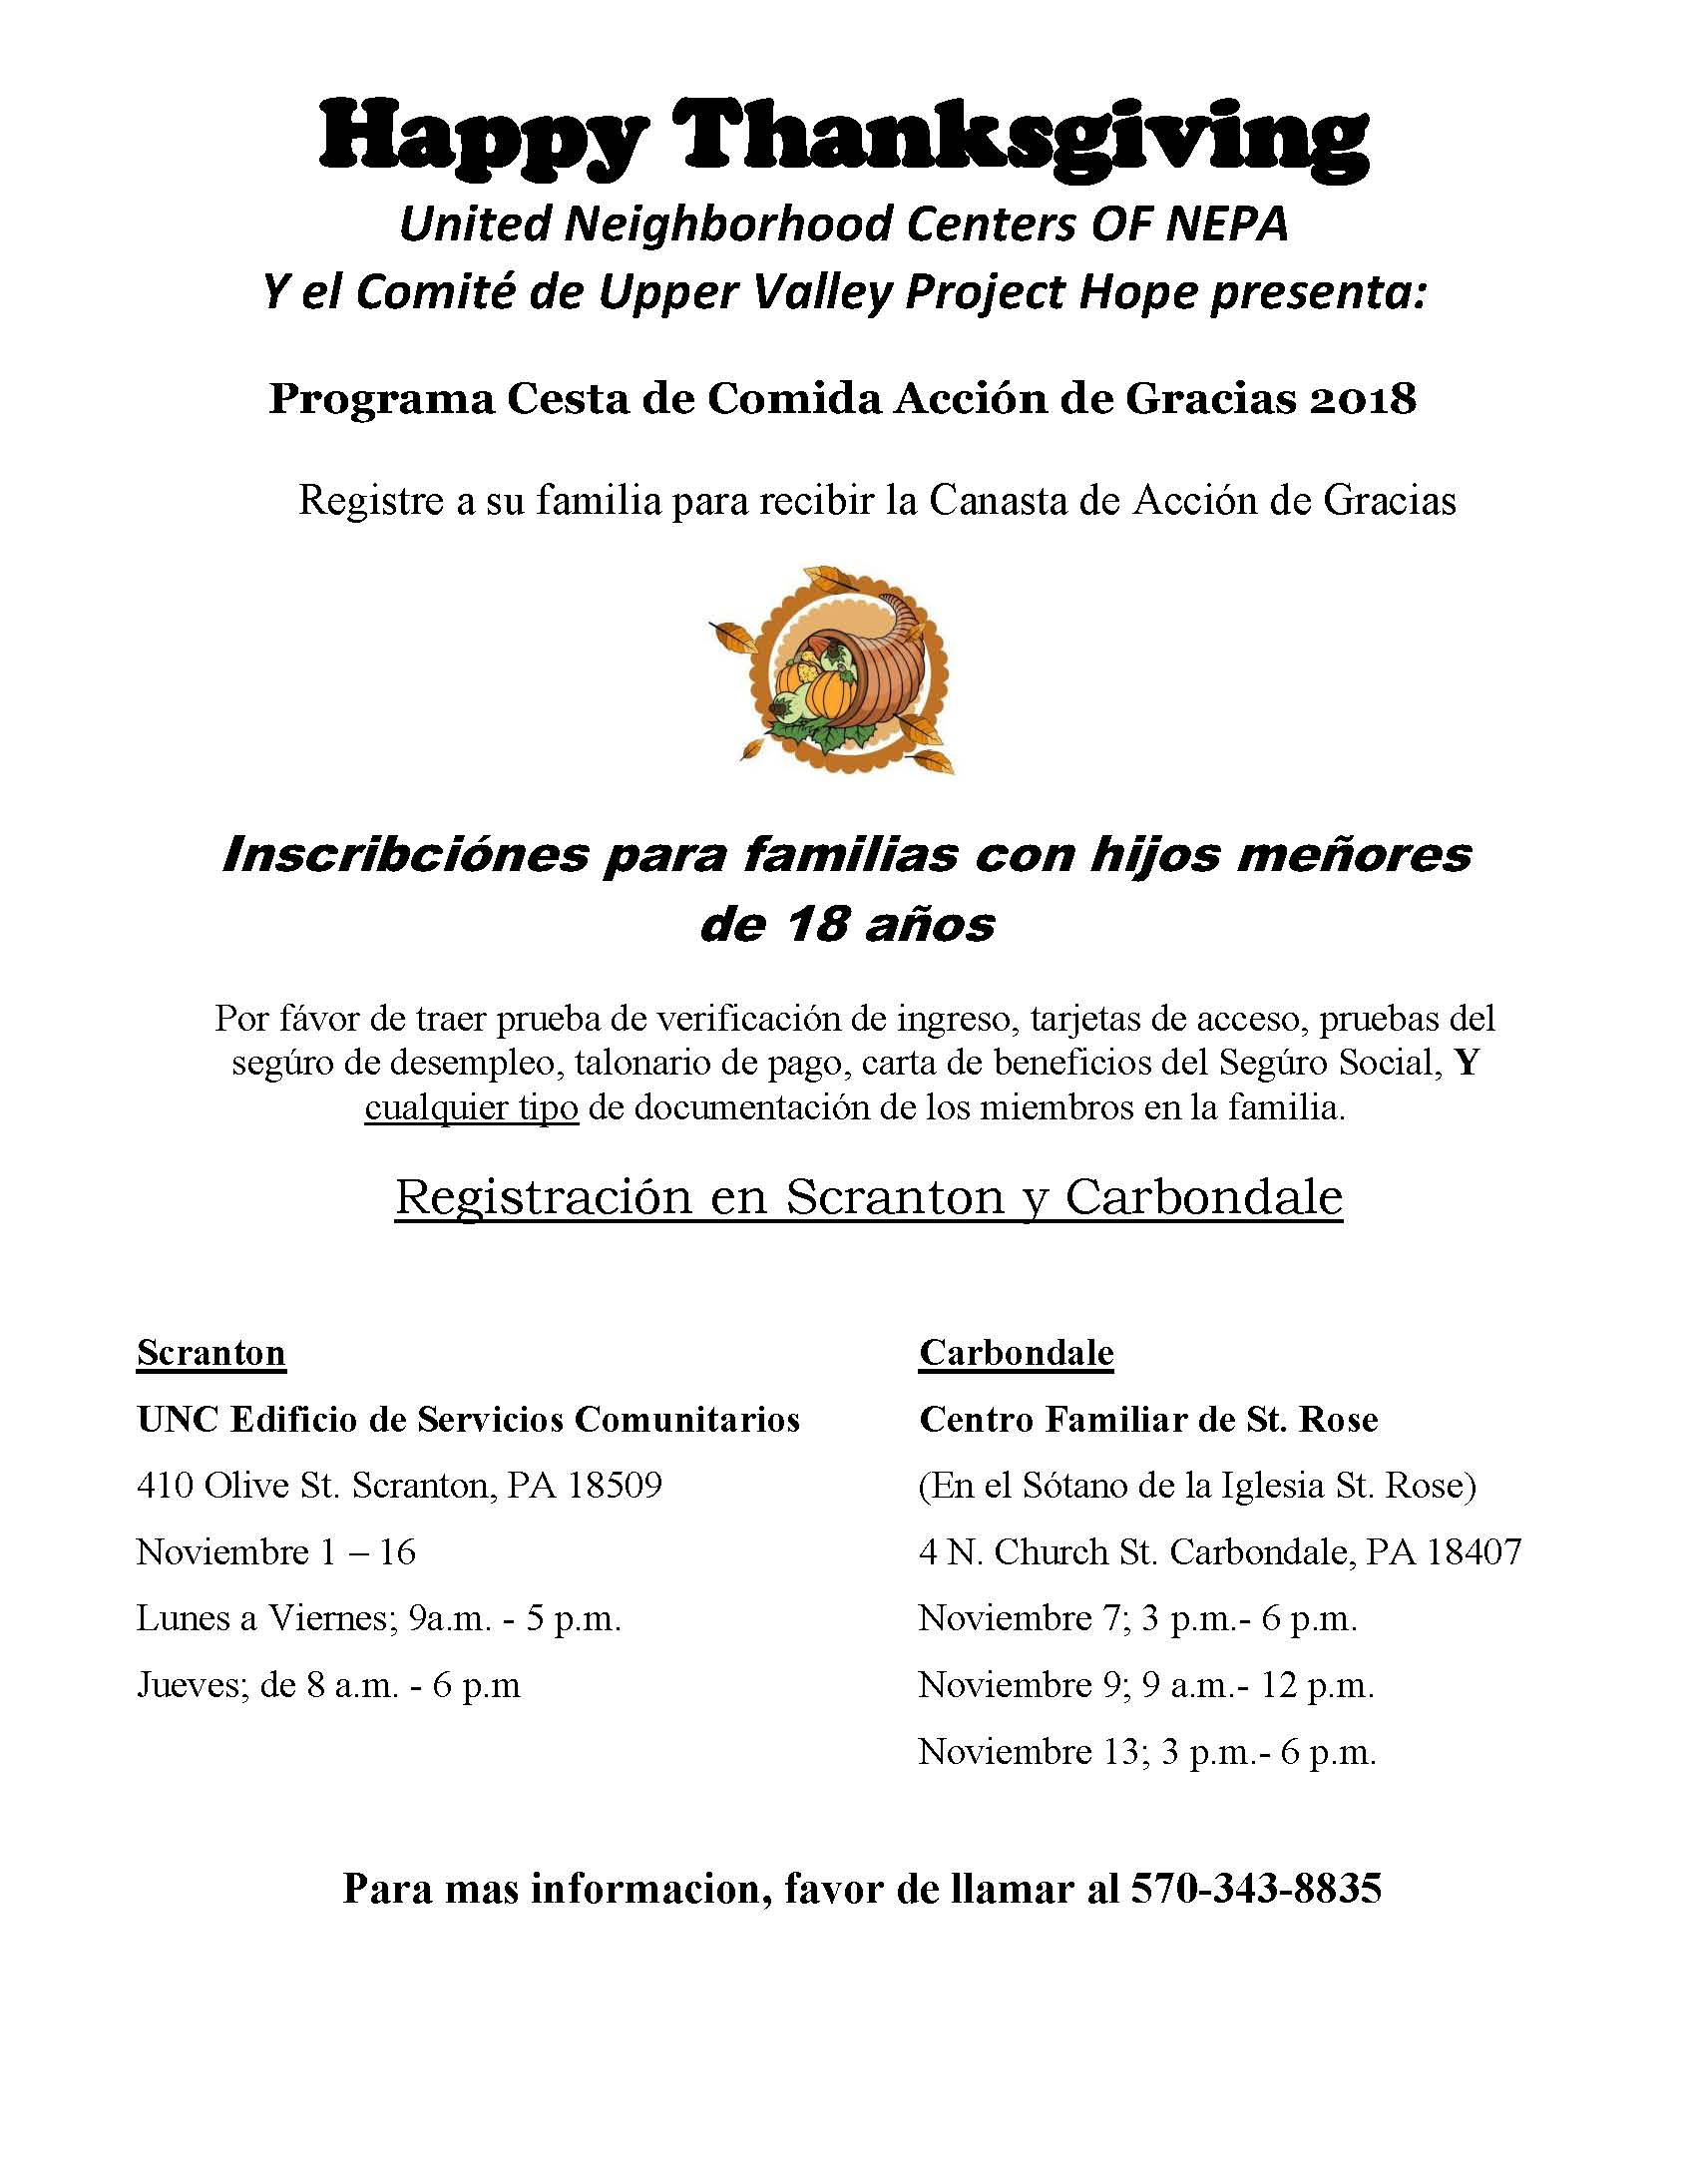 Thanksgiving Program Spanish Flyer 2018 - United Neighborhood